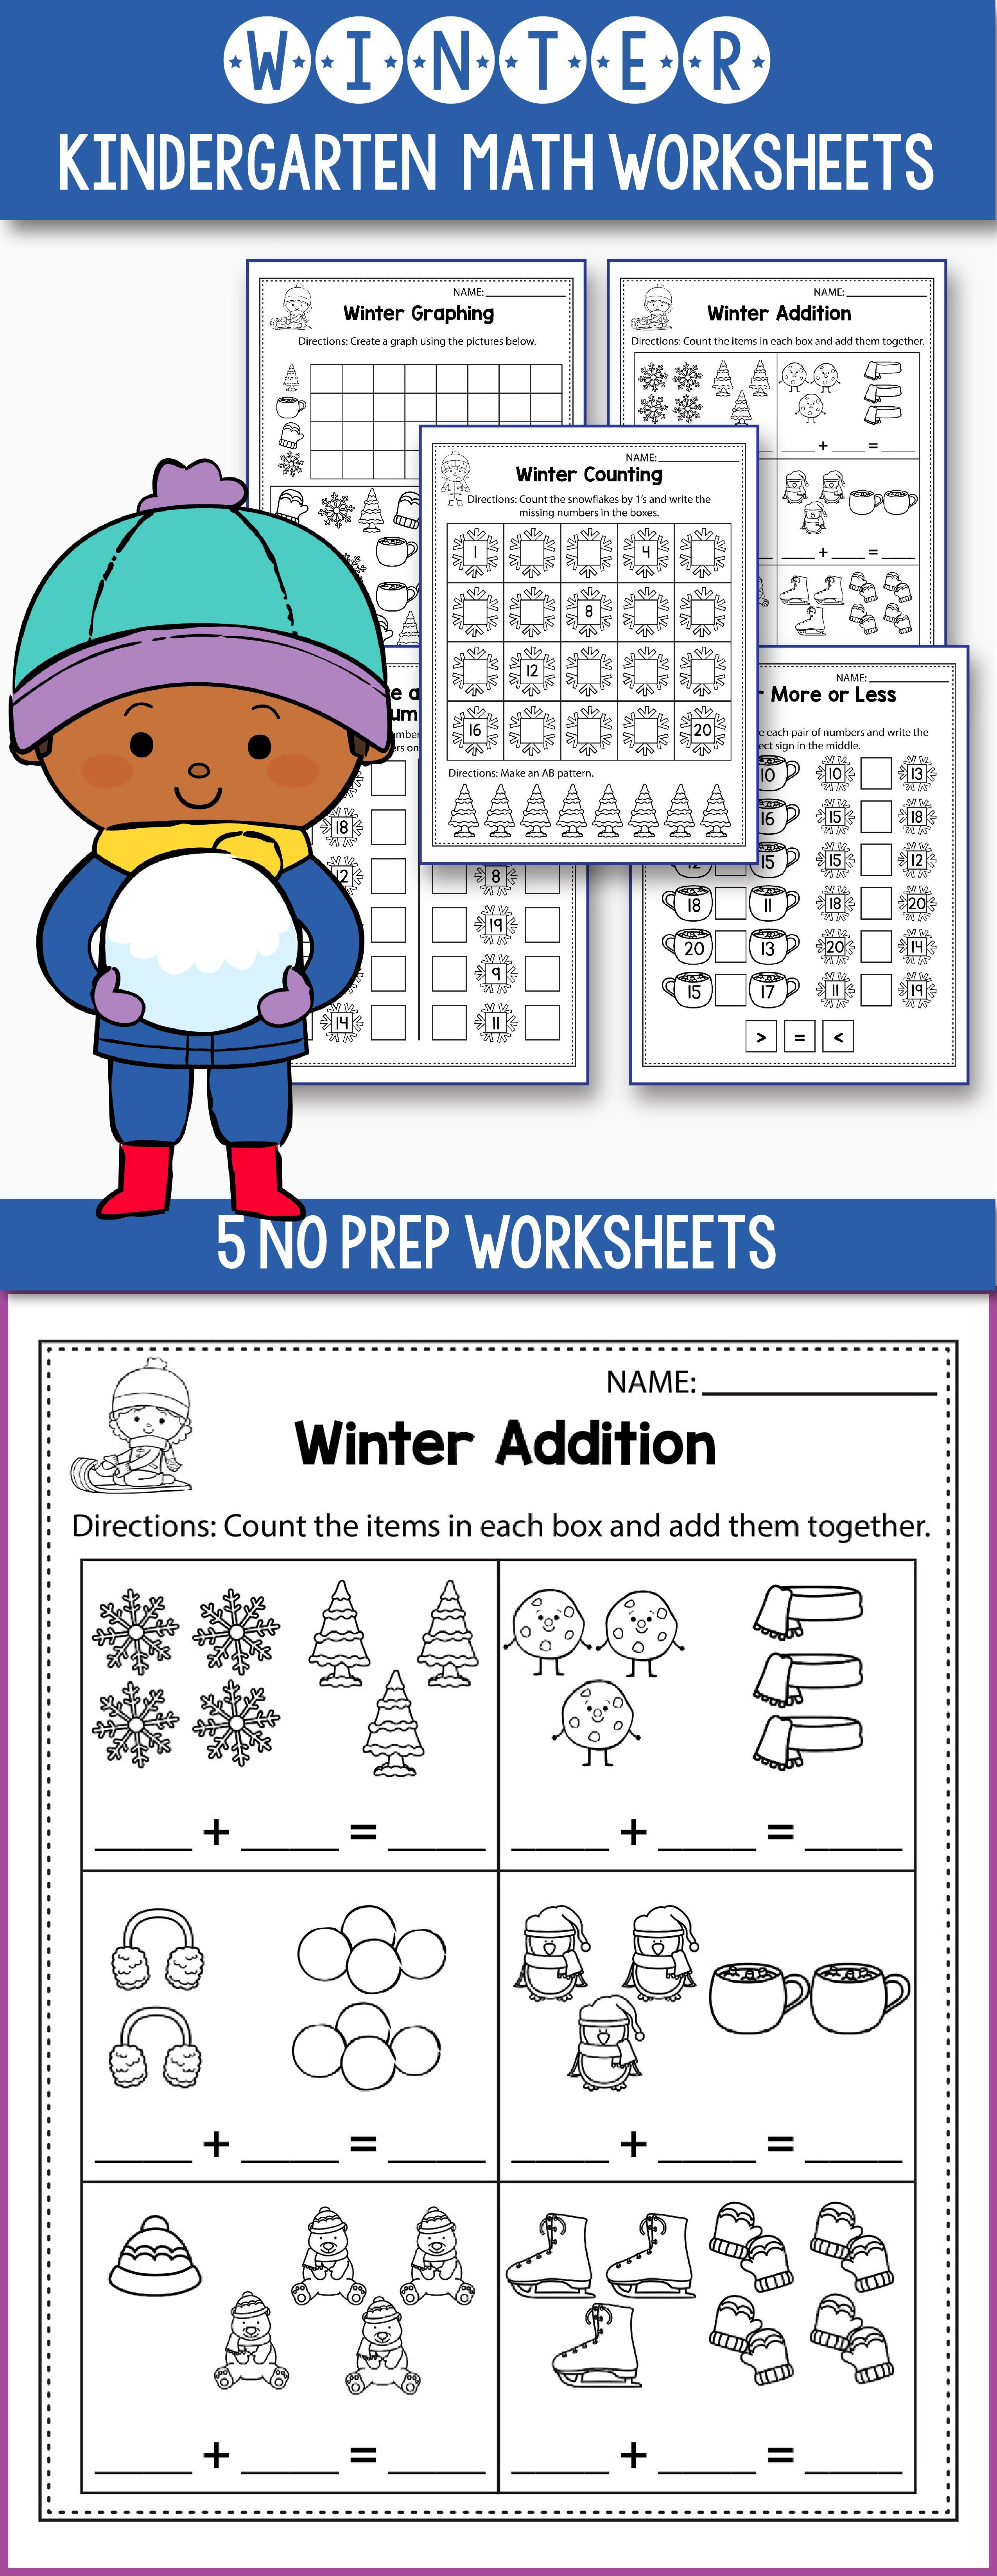 Free Winter Math Worksheets For Kindergarten Includes Some Fun Winter Games For Winter Math Worksheets Winter Math Kindergarten Kindergarten Math Worksheets [ 6588 x 2550 Pixel ]